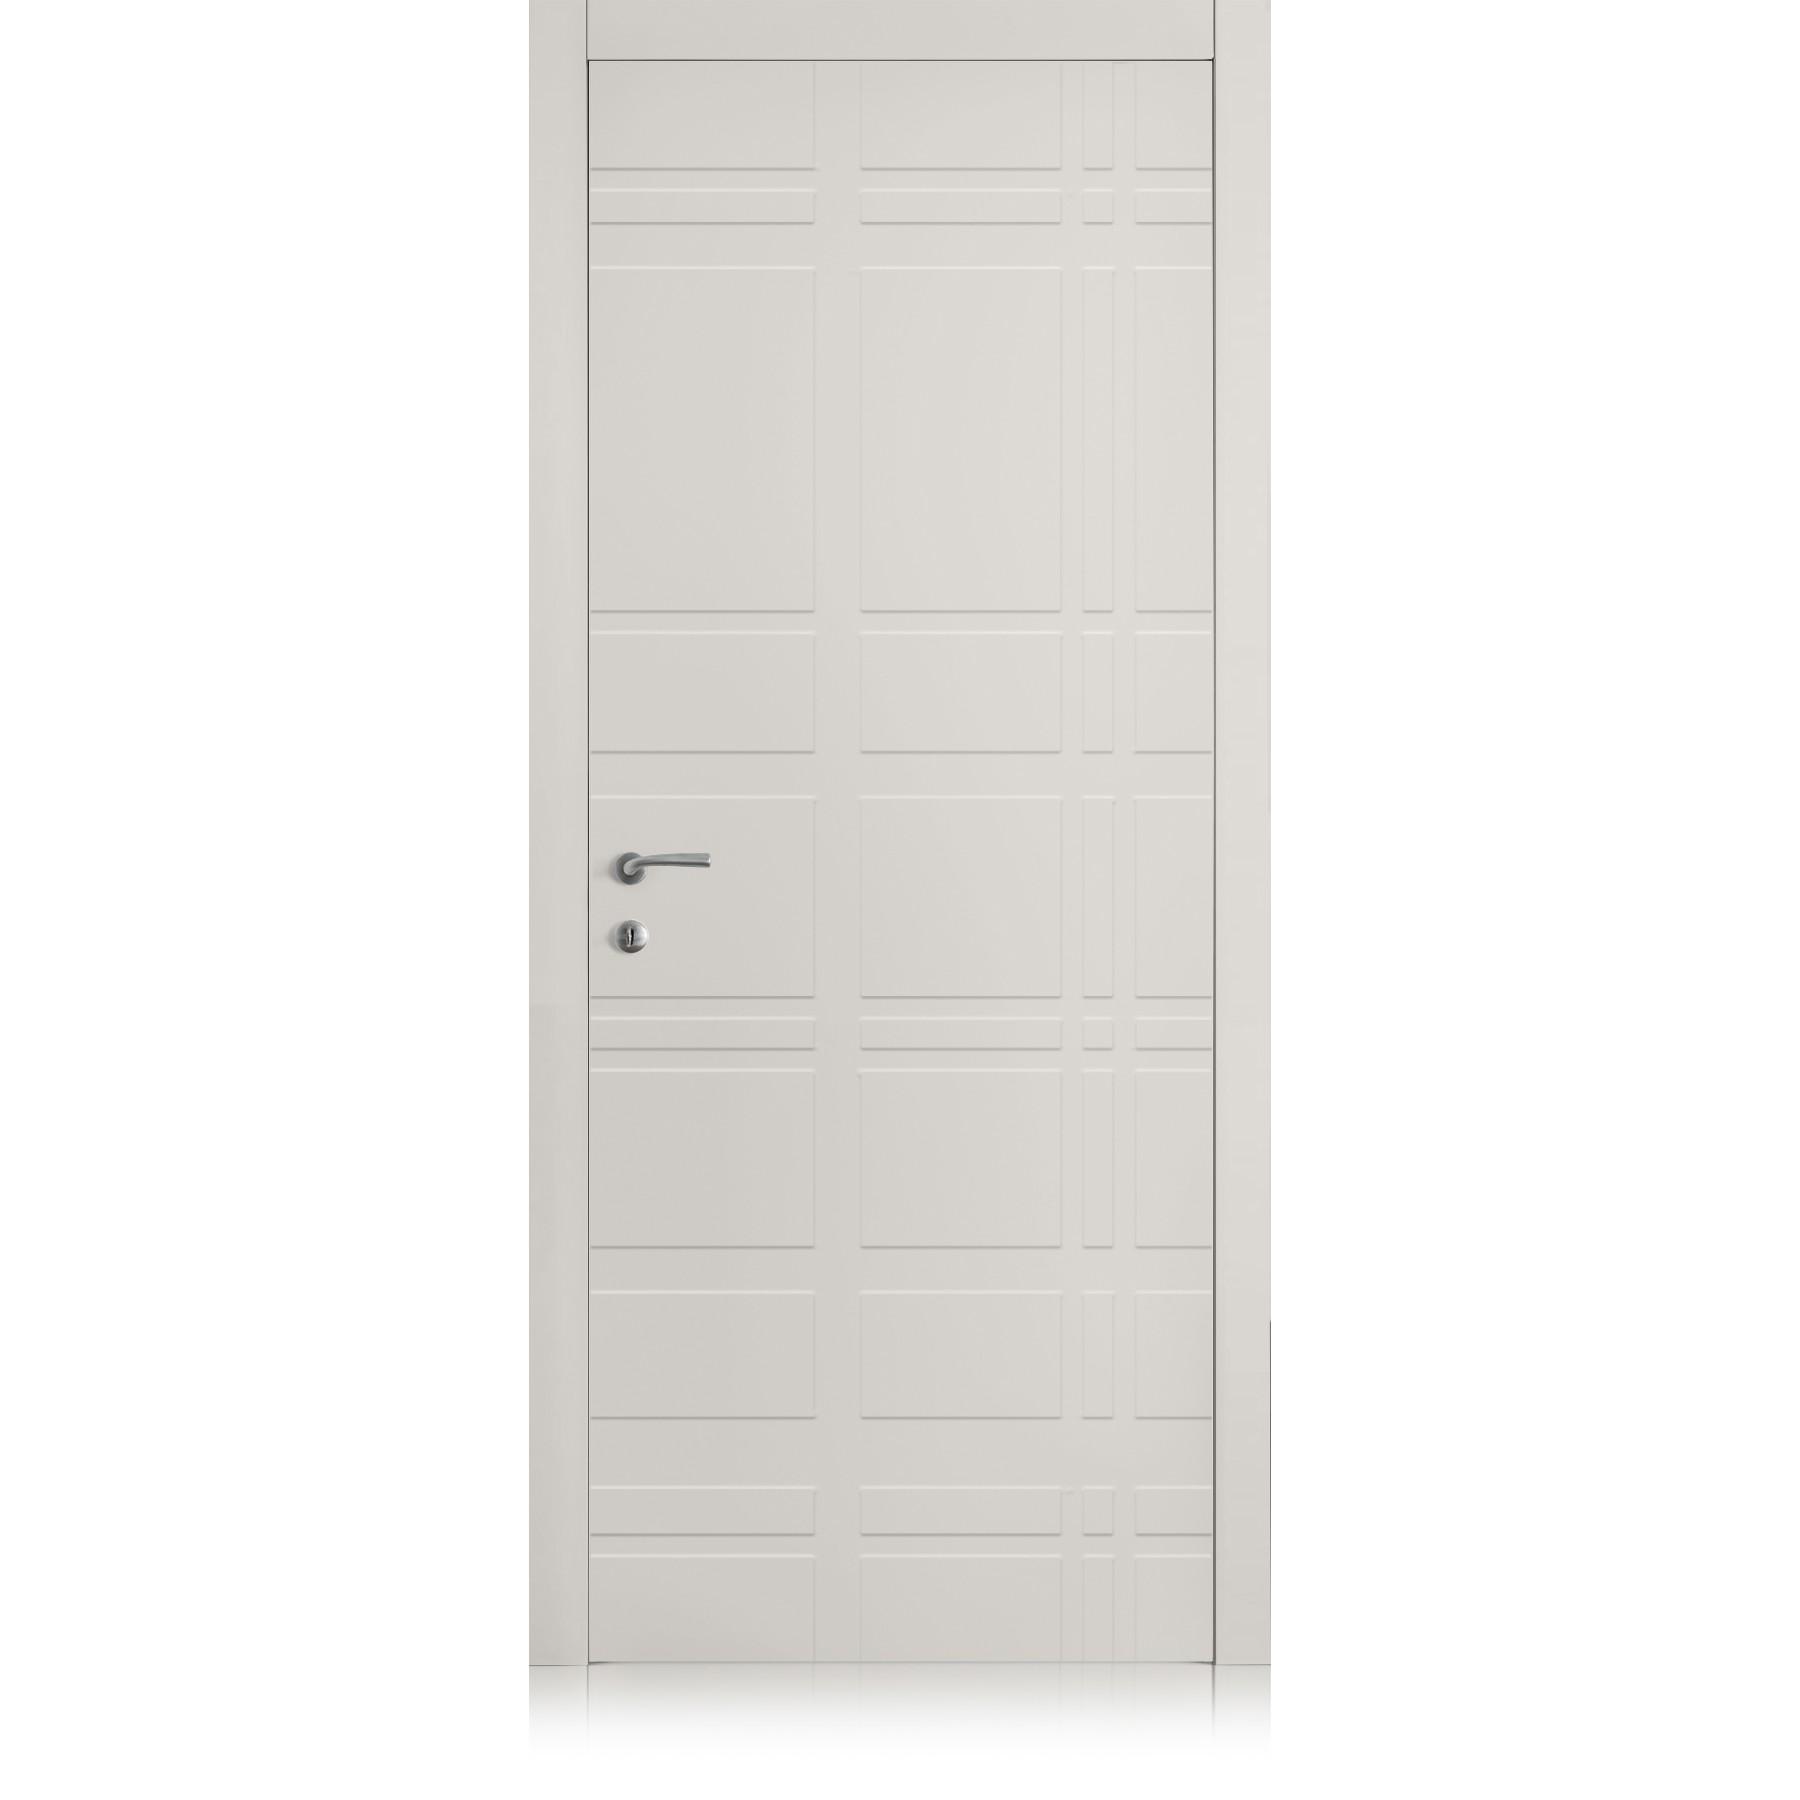 Yncisa Tartan grigio lux door